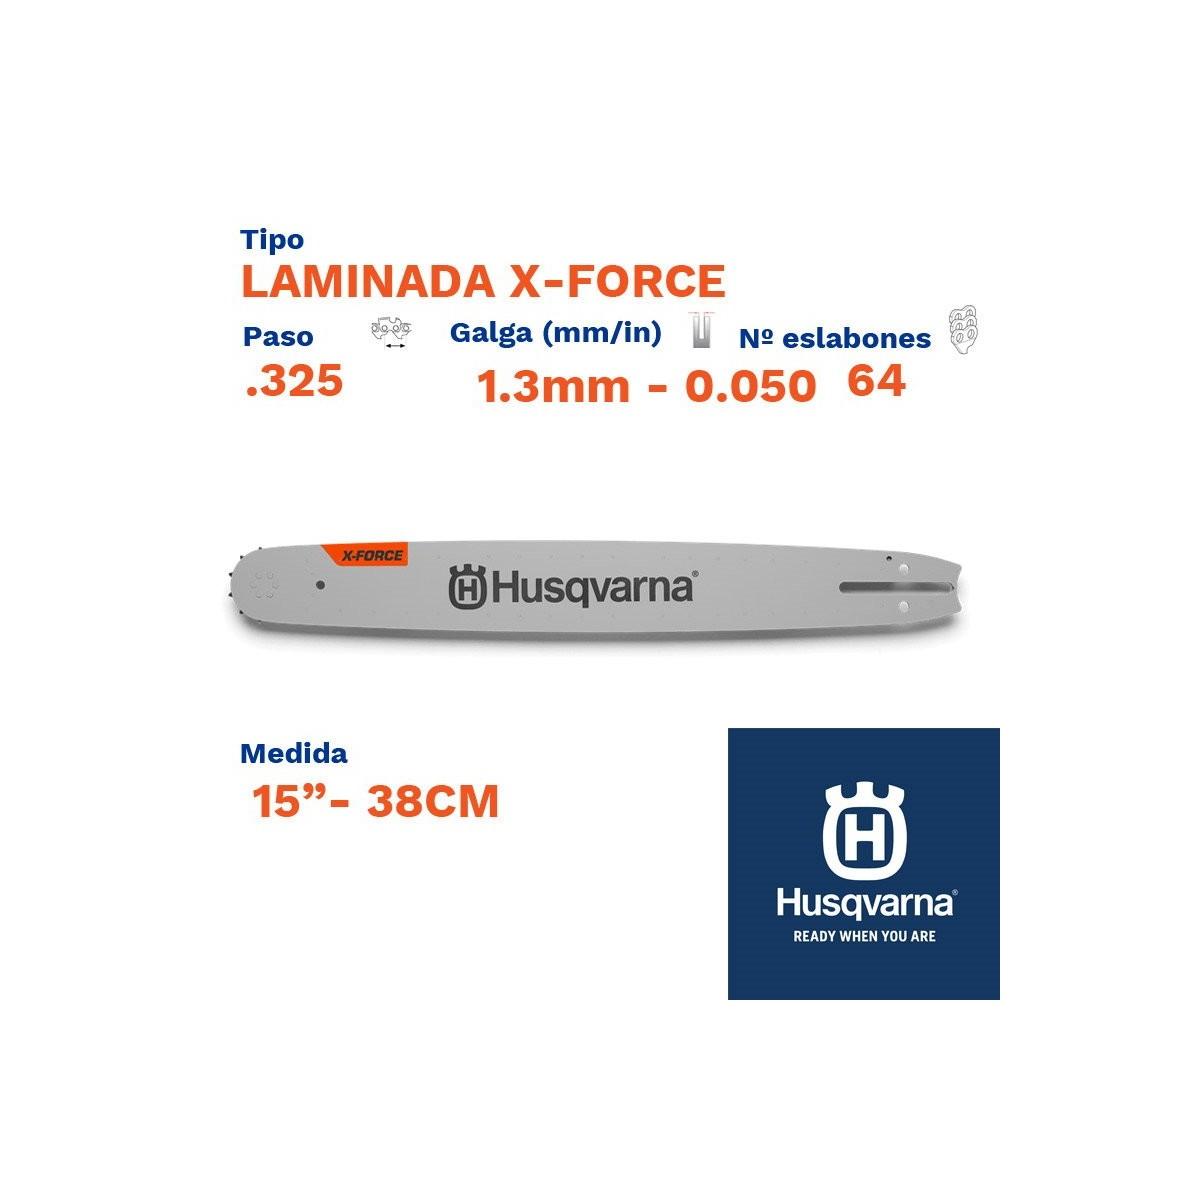 "Husqvarna espada laminada x-force 1.3mm 64  eslabones-pc .325  15""- 38cm"